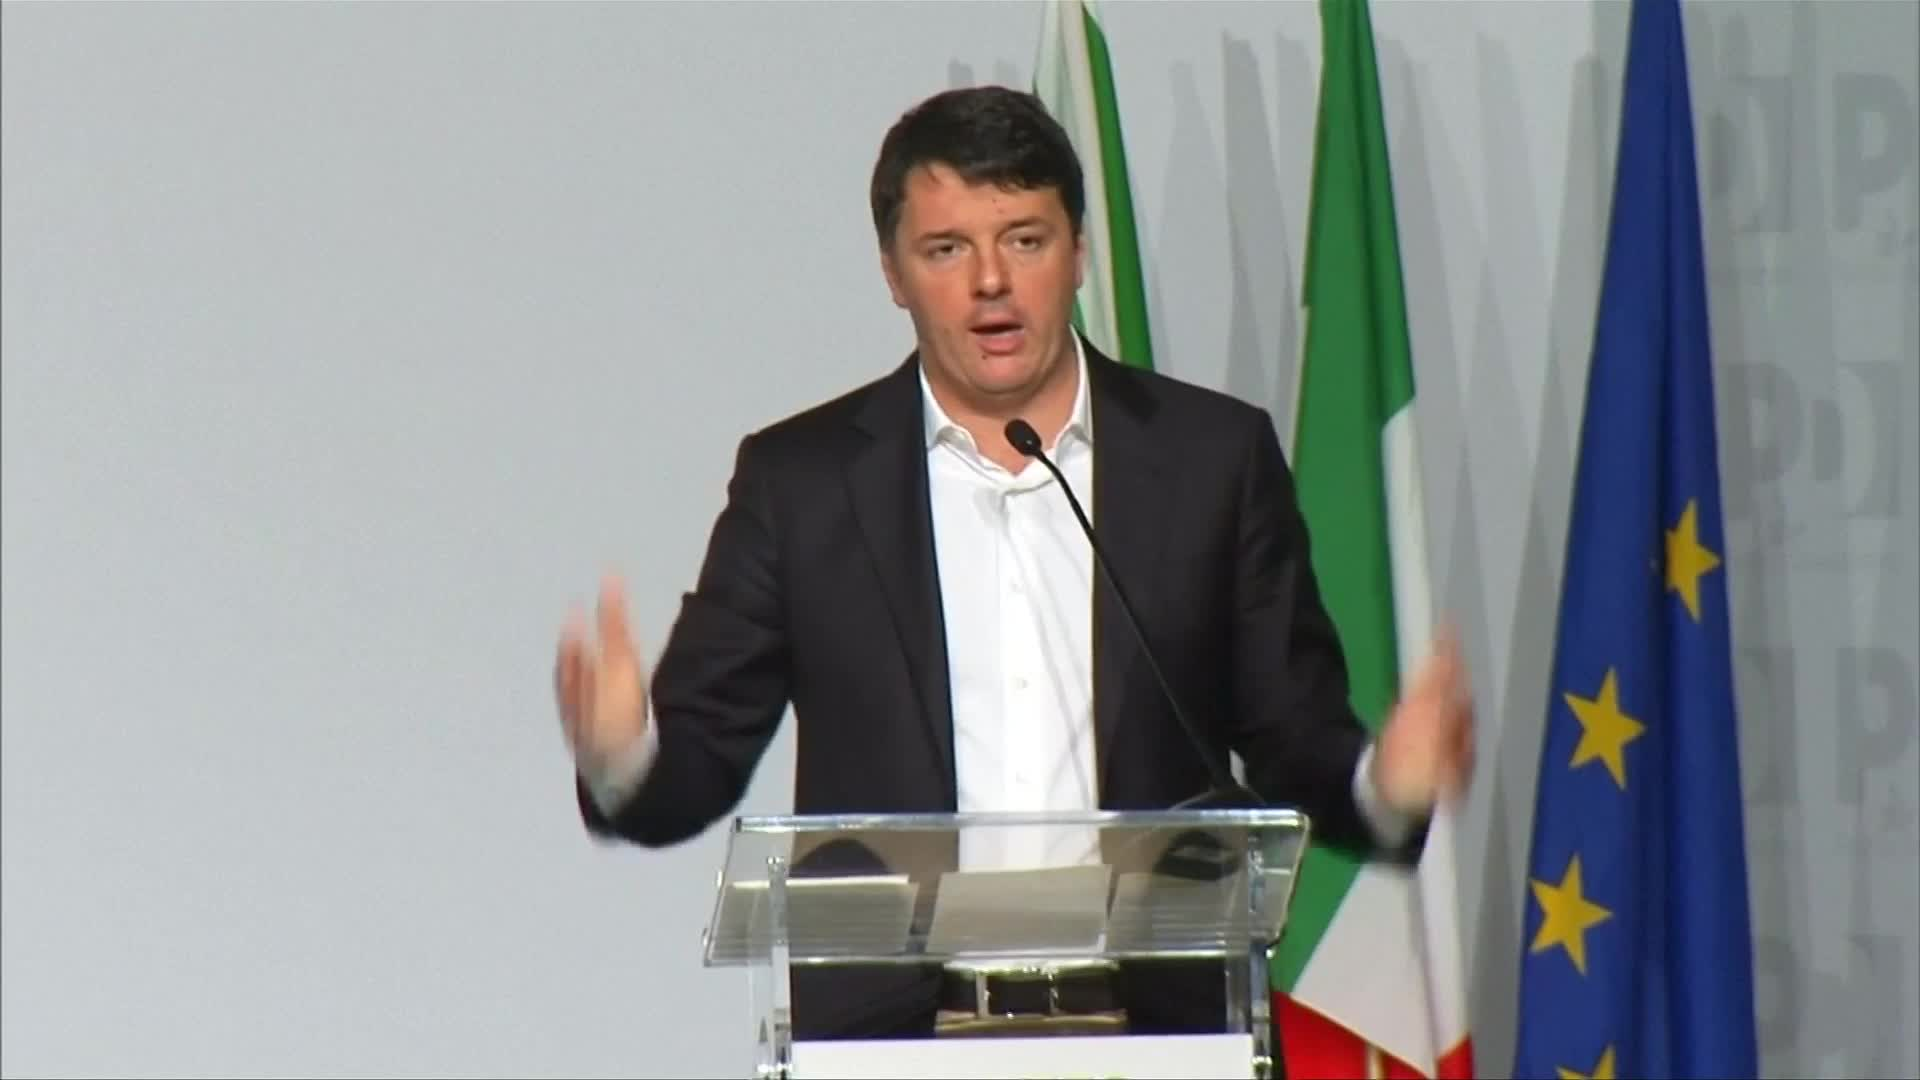 Italy's Renzi quits party in bid to retake PM